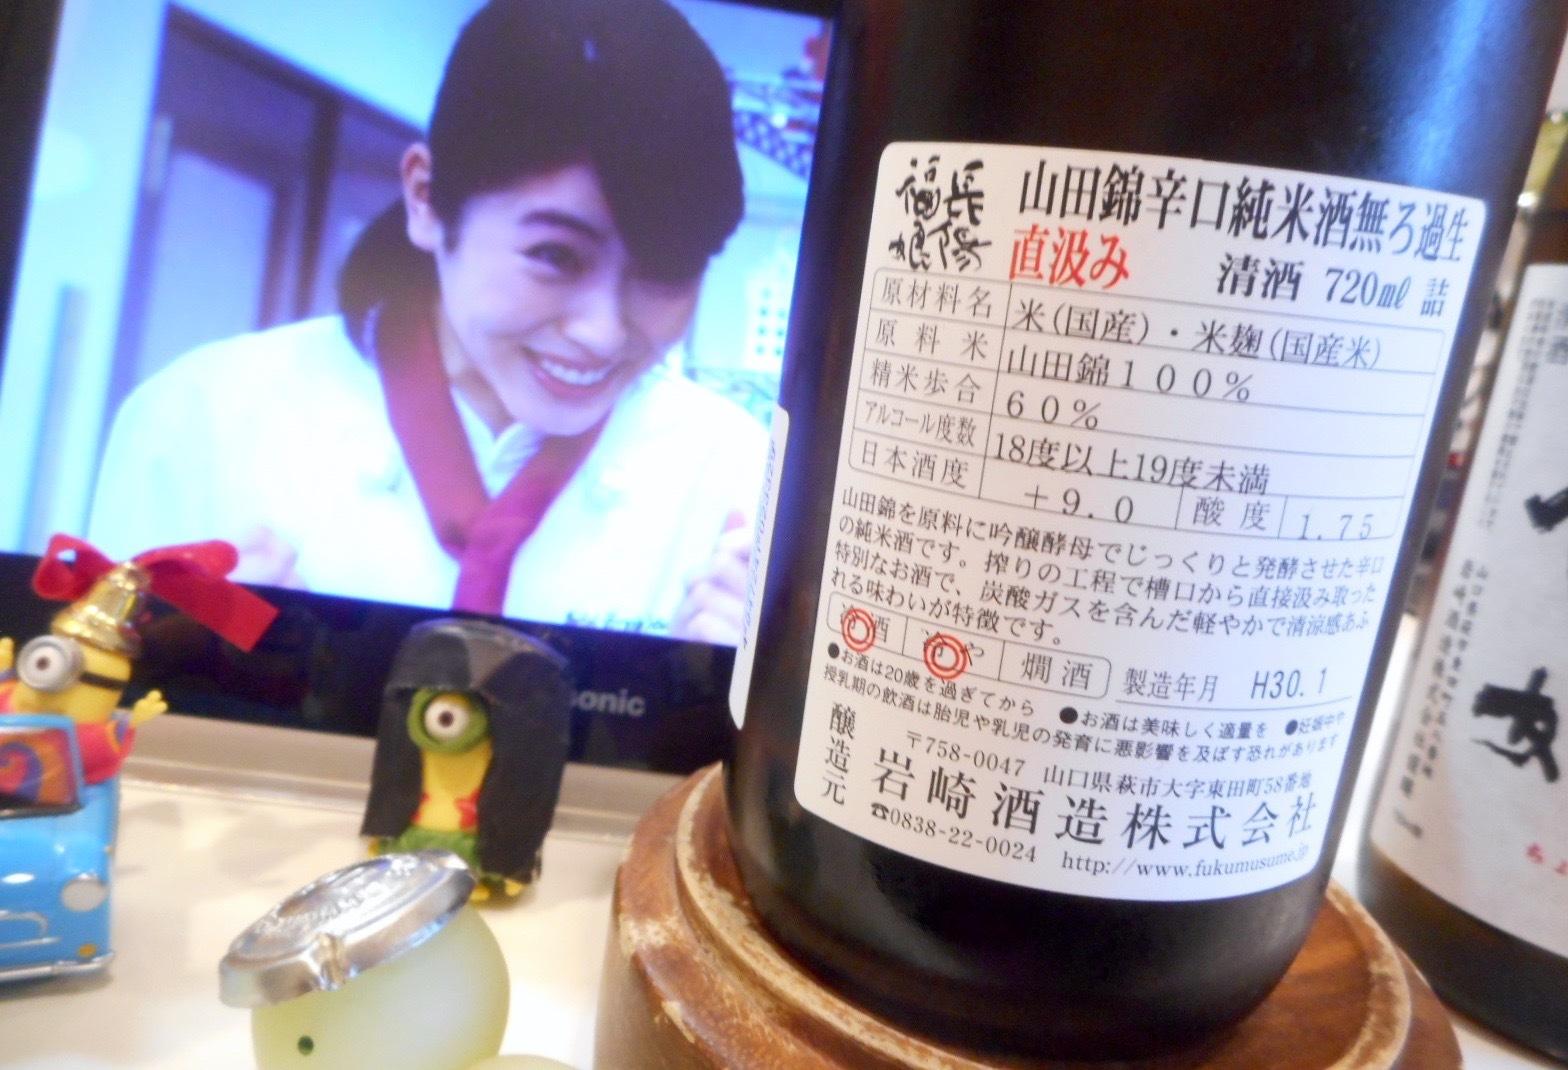 musume_karakuchi_jikagumi29by3_2.jpg